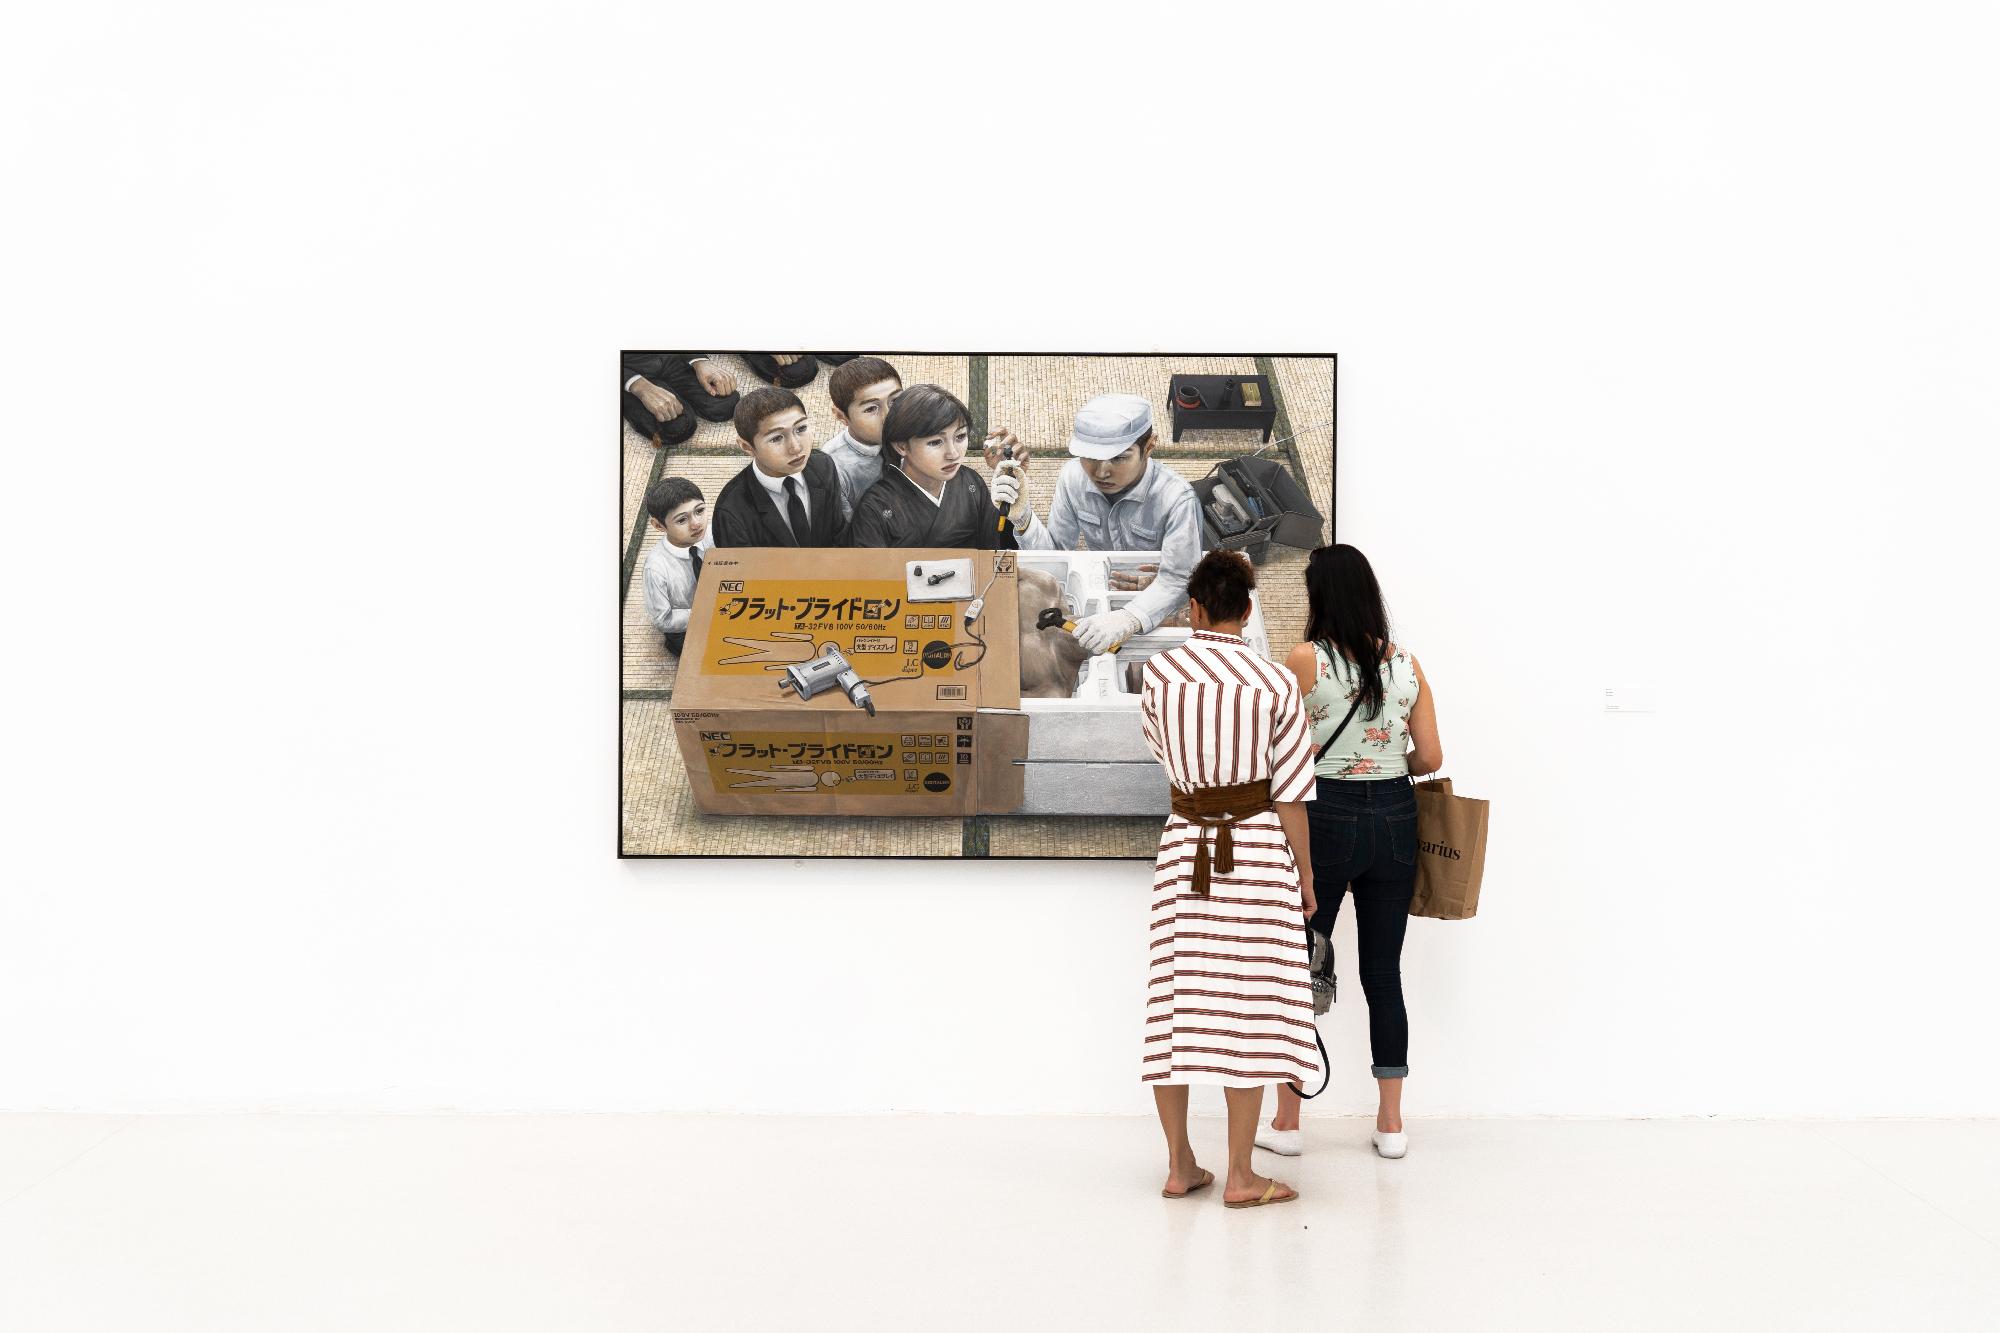 CaballeroCosmica-ExhibitionPhoto-Tetsuya-Ishida-palaciovelazquez-3-p.jpg